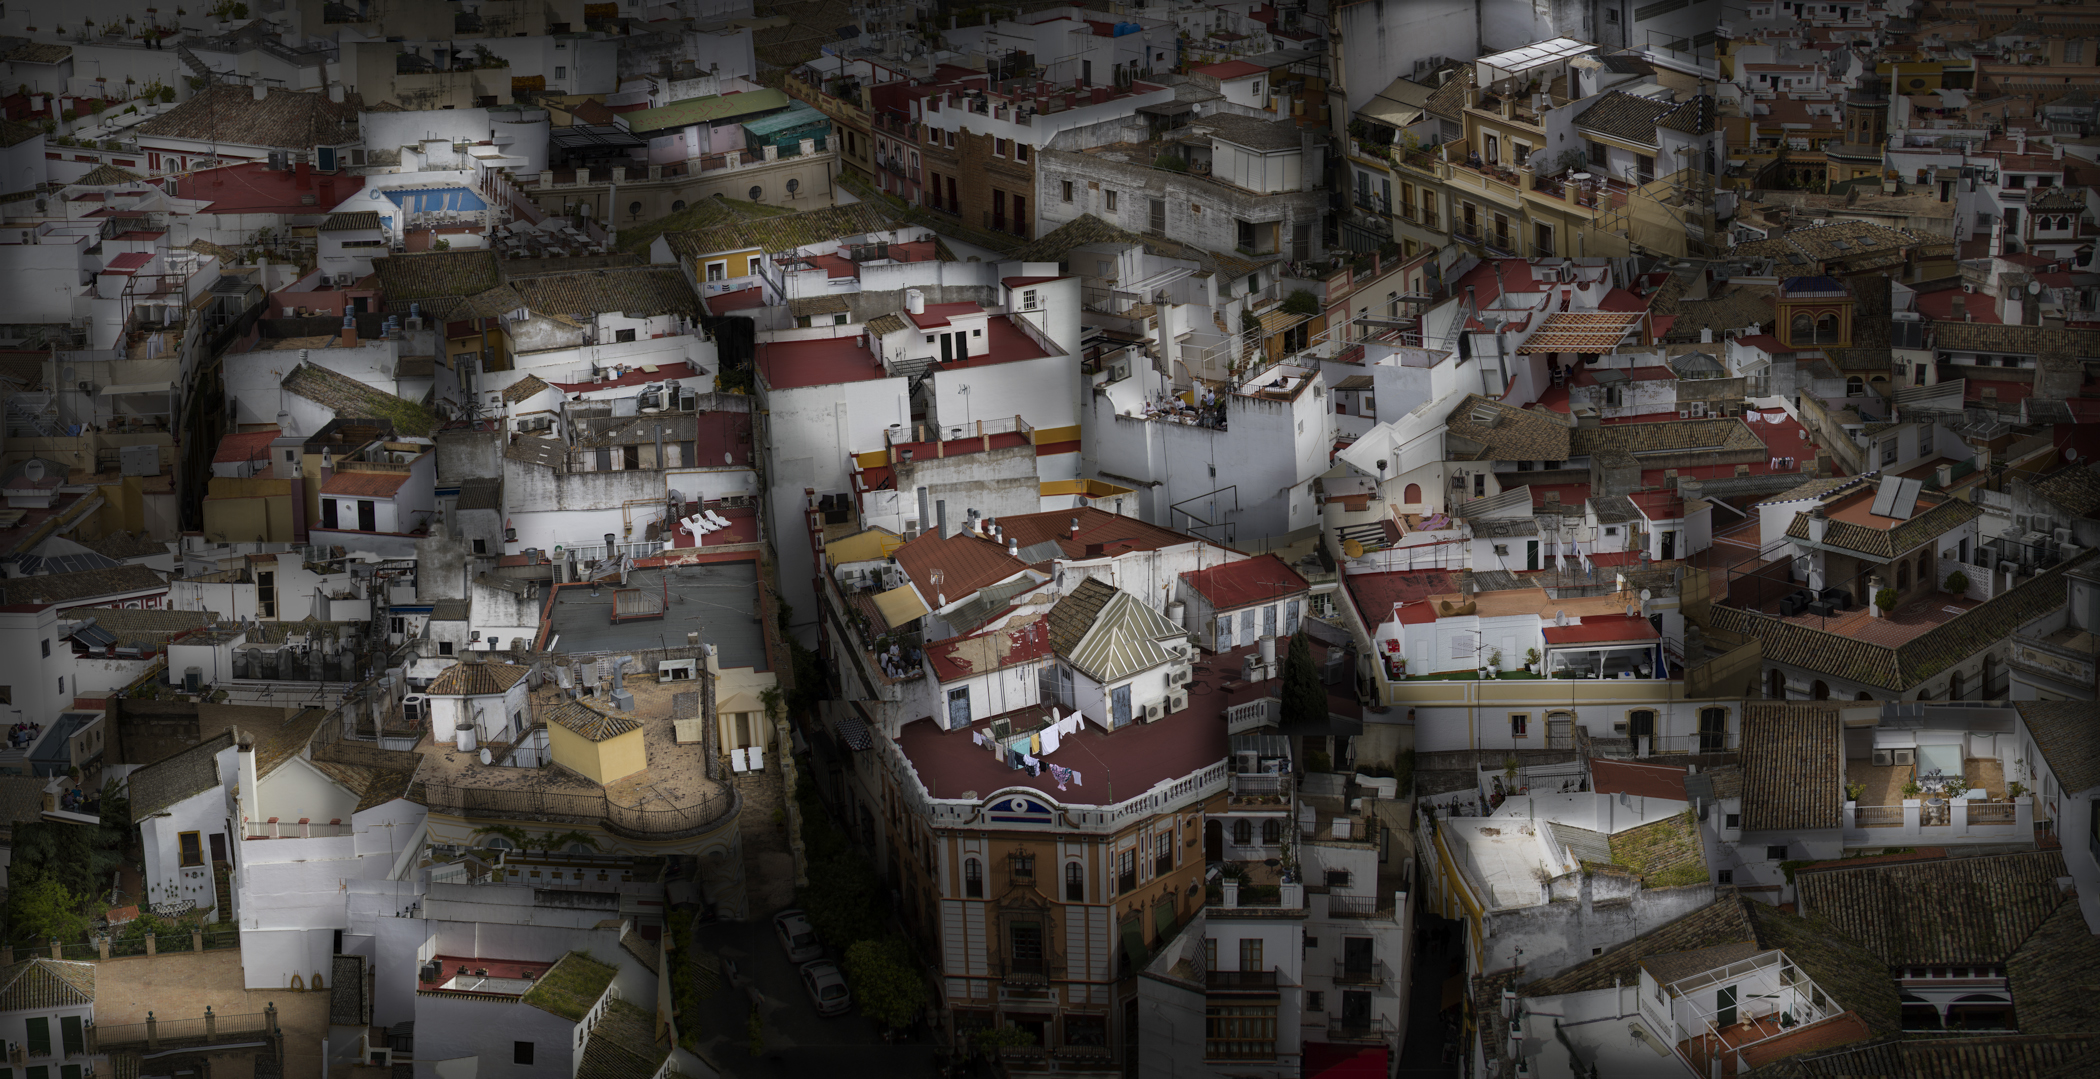 Seville, Spain  (Studio Art in Spain, University of Washington, Leon Spain, 2013)